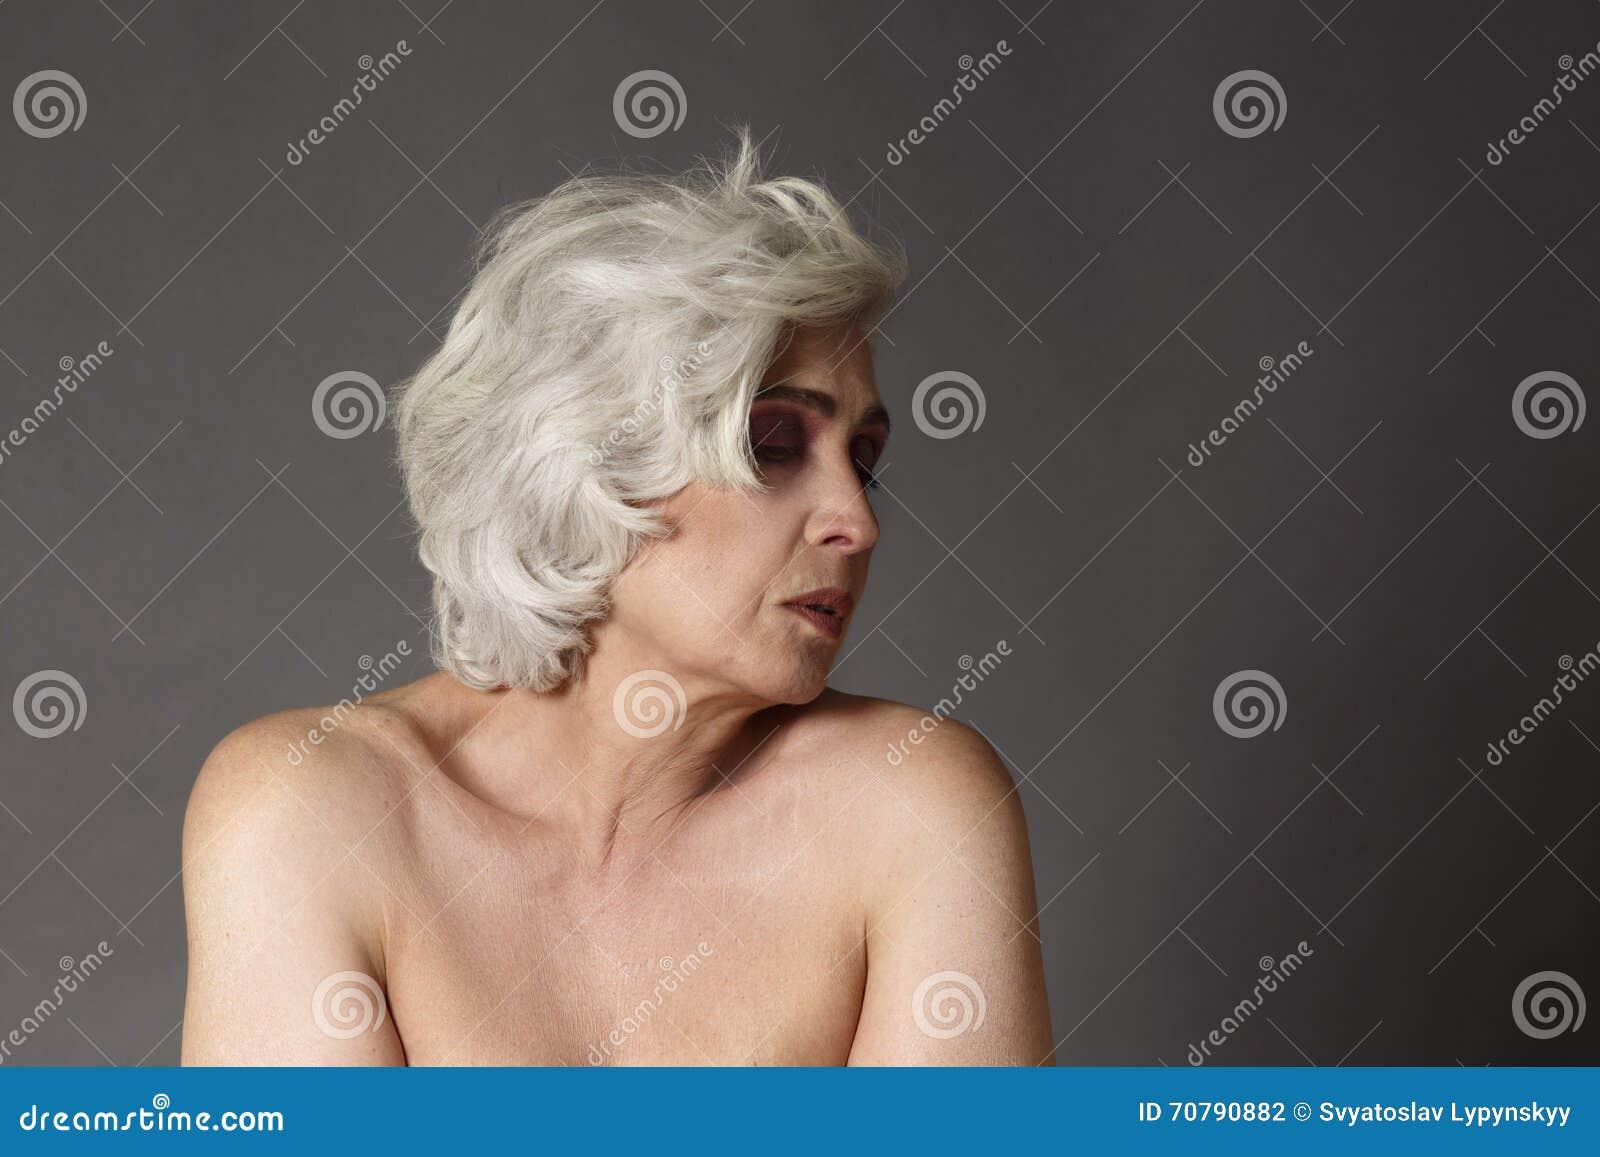 Mujer Desnuda Madura Foto De Archivo Imagen De Maquillaje 70790882